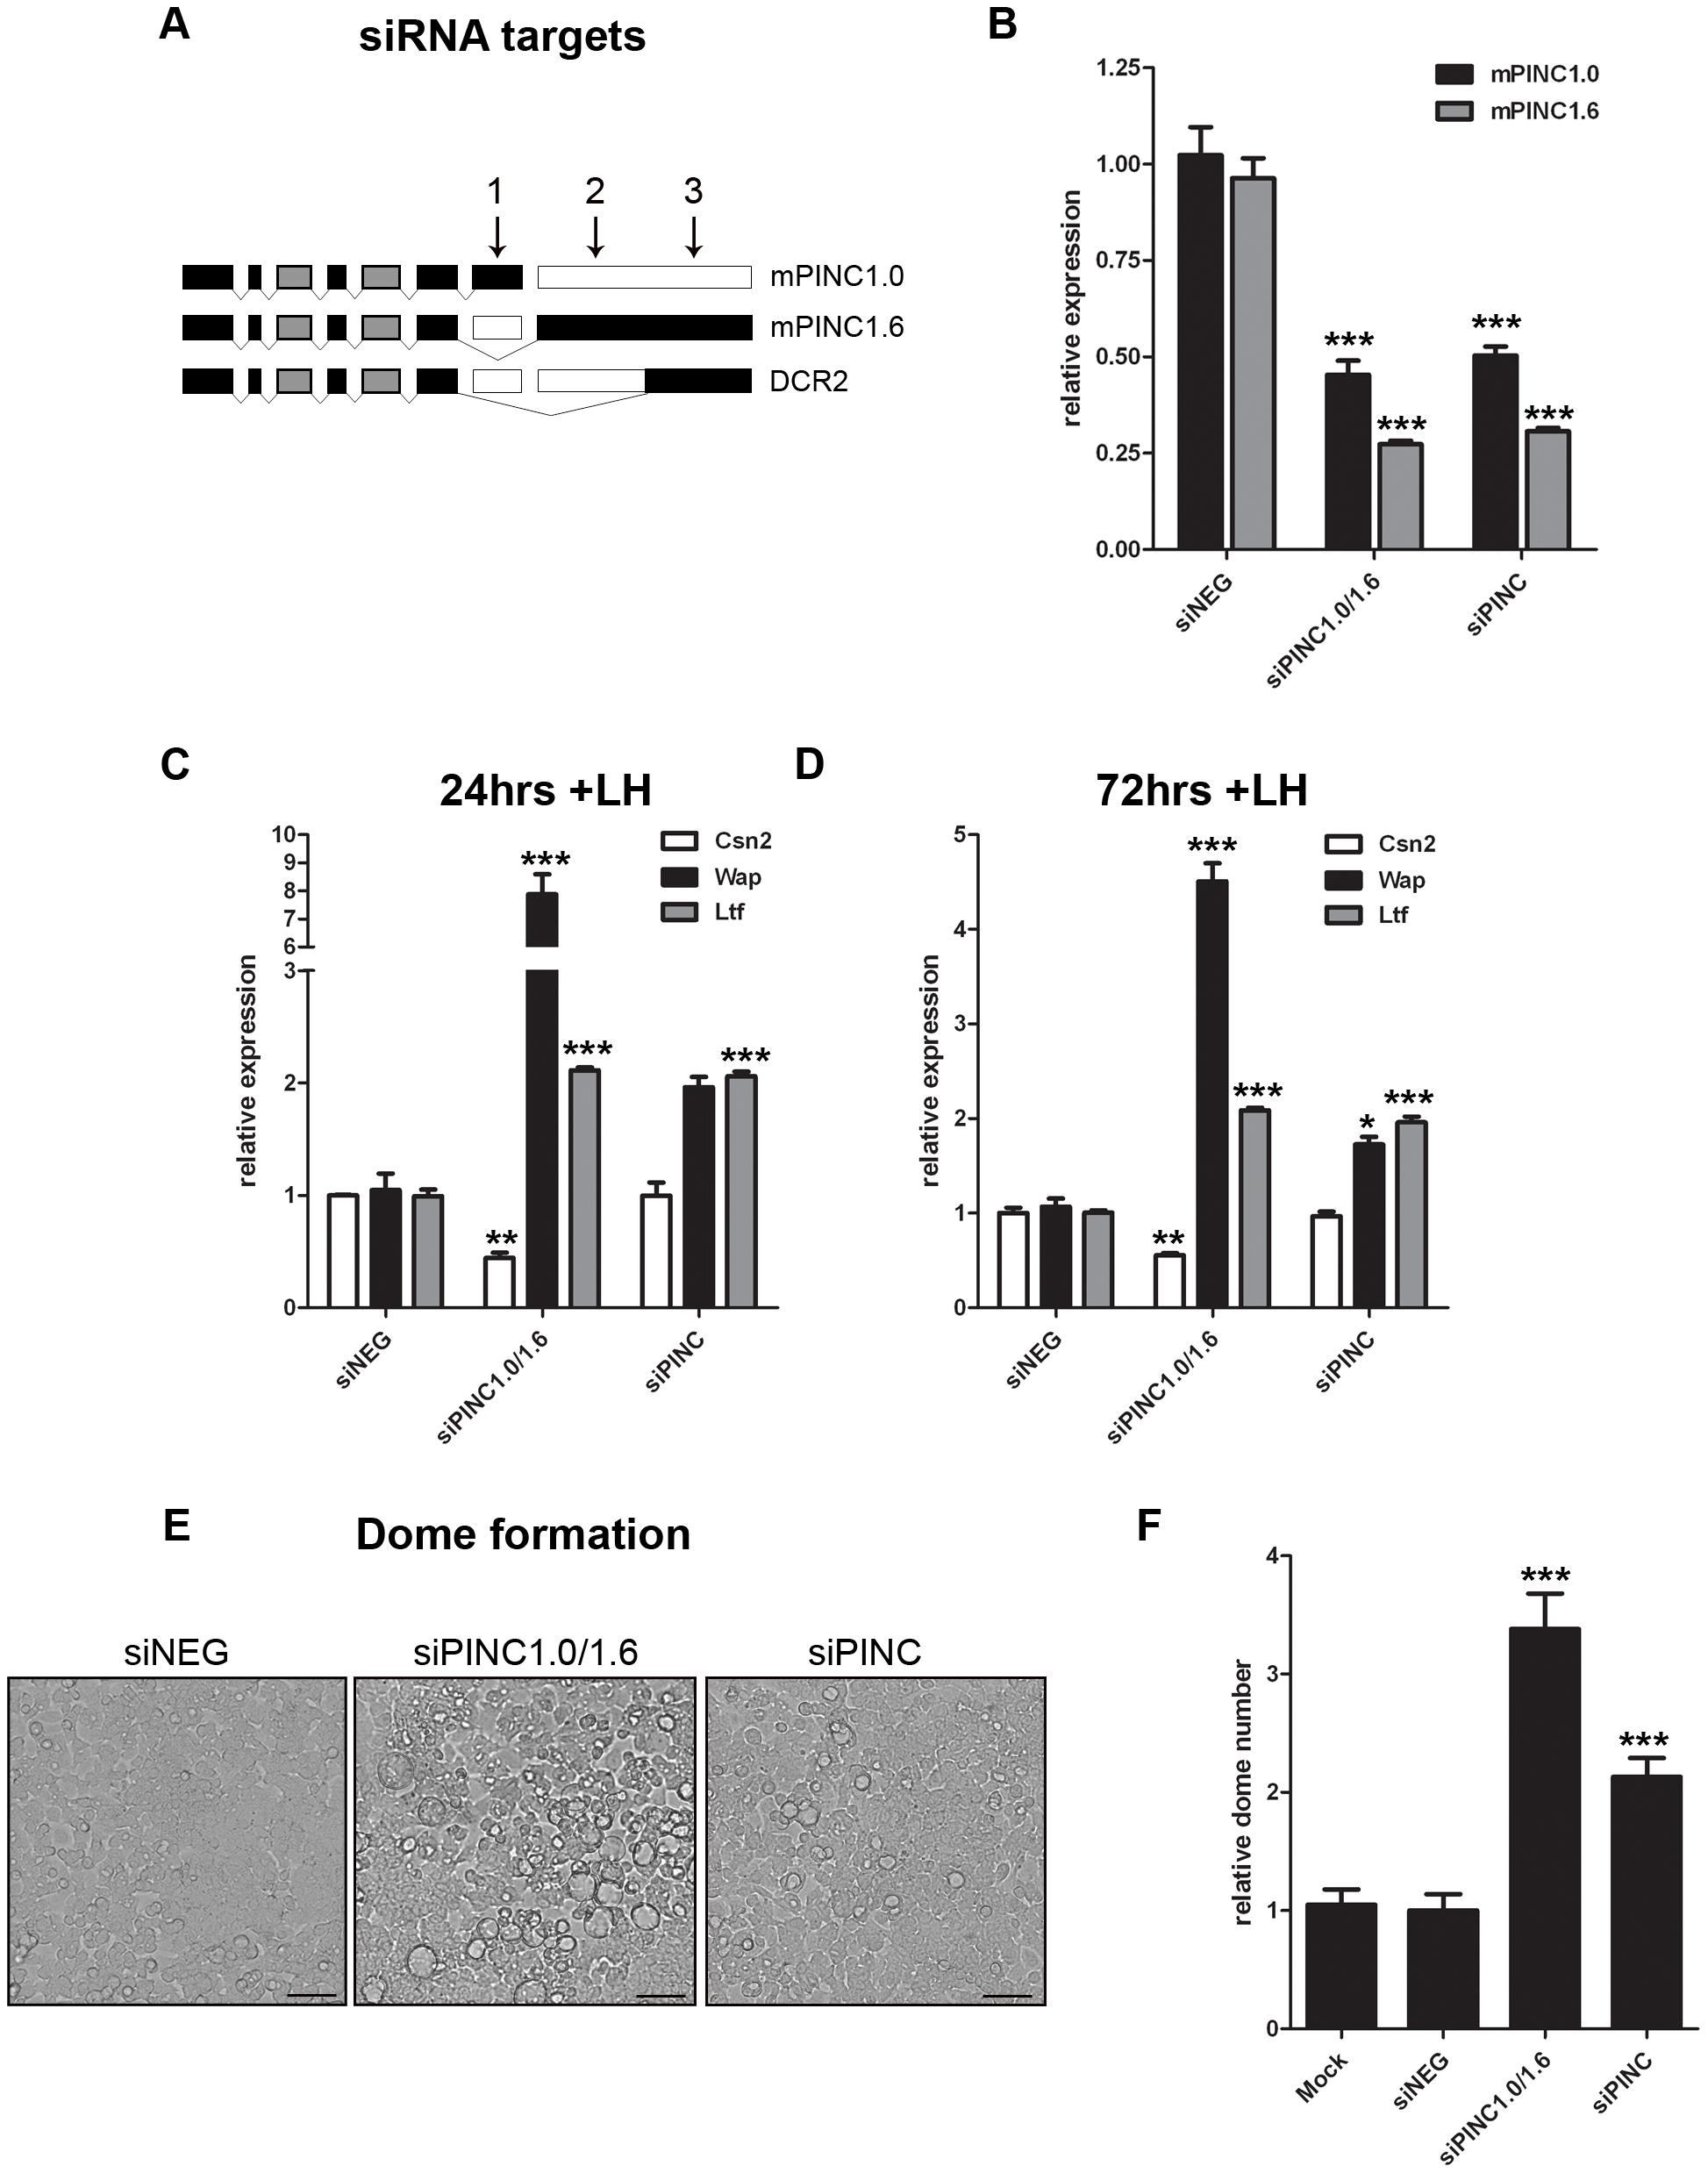 Knockdown of <i>mPINC</i> enhances differentiation of HC11 cells.